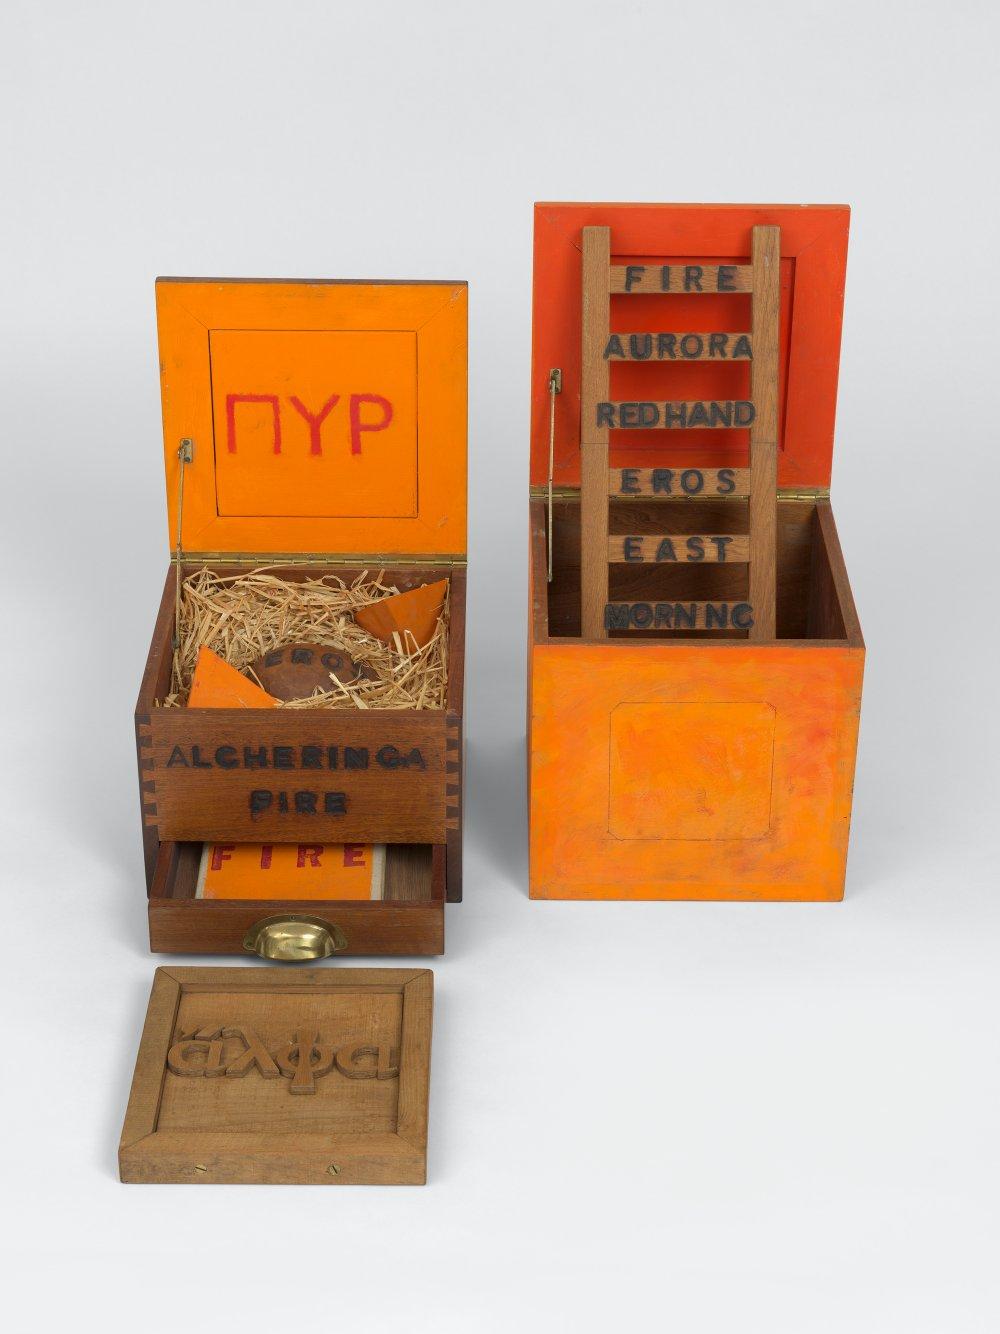 Alcheringa Fire Box & Fire Box